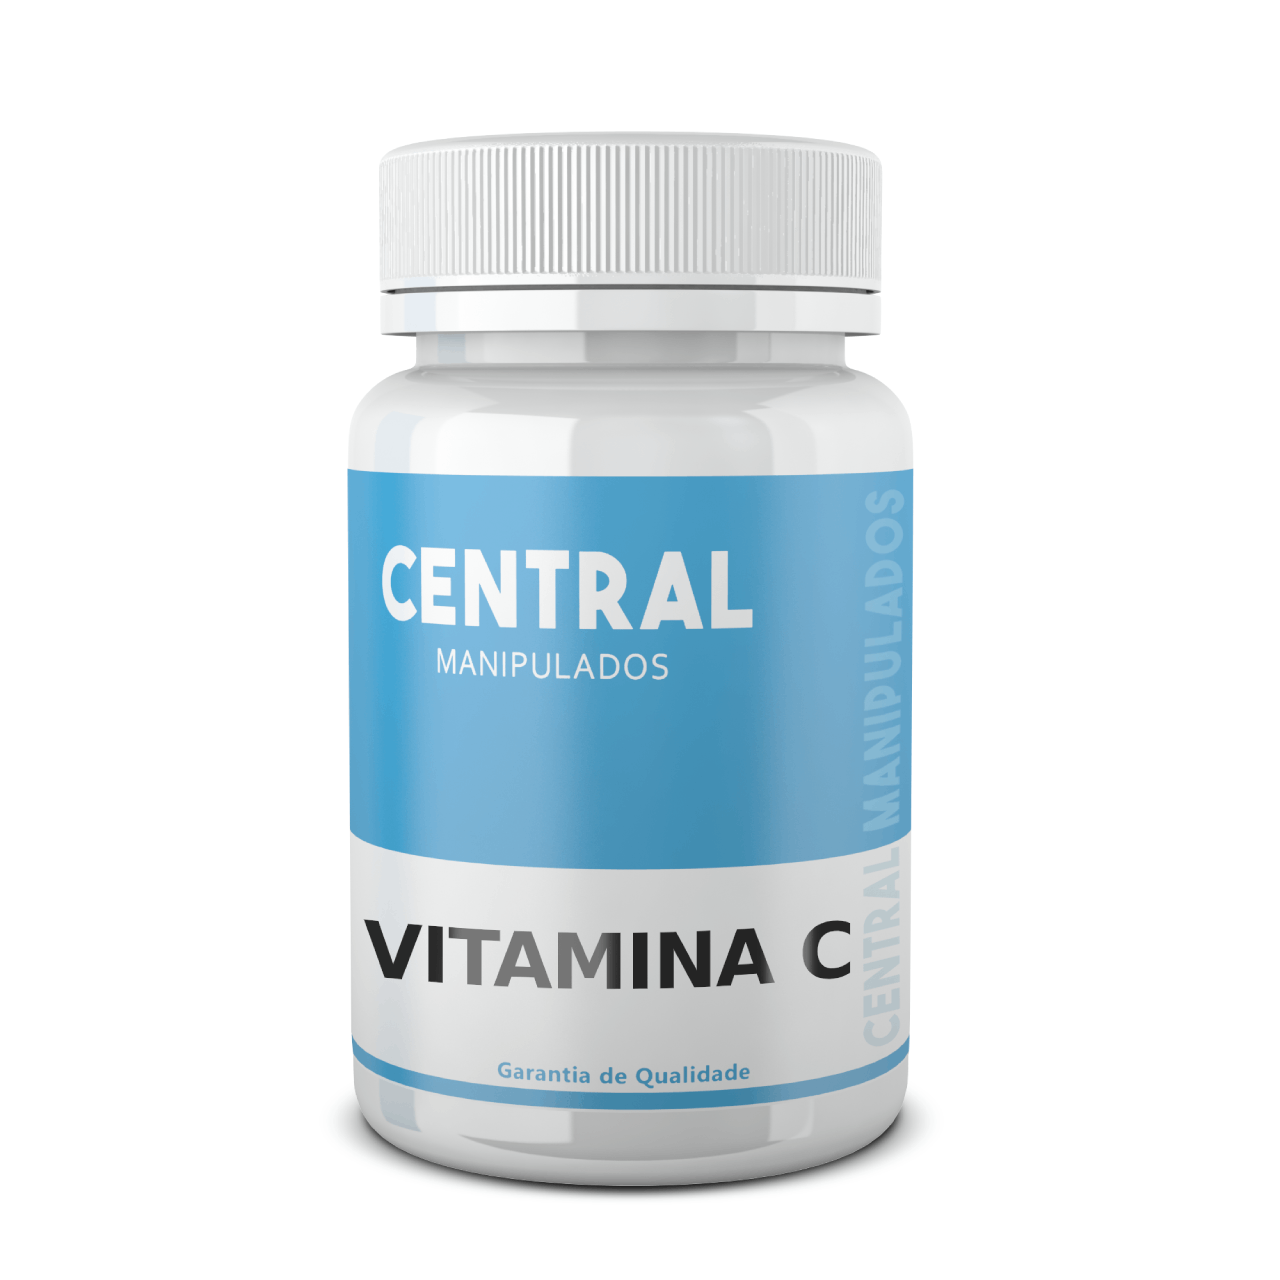 Vitamina C 500mg - 90 cápsulas - Reforço para Imunidade